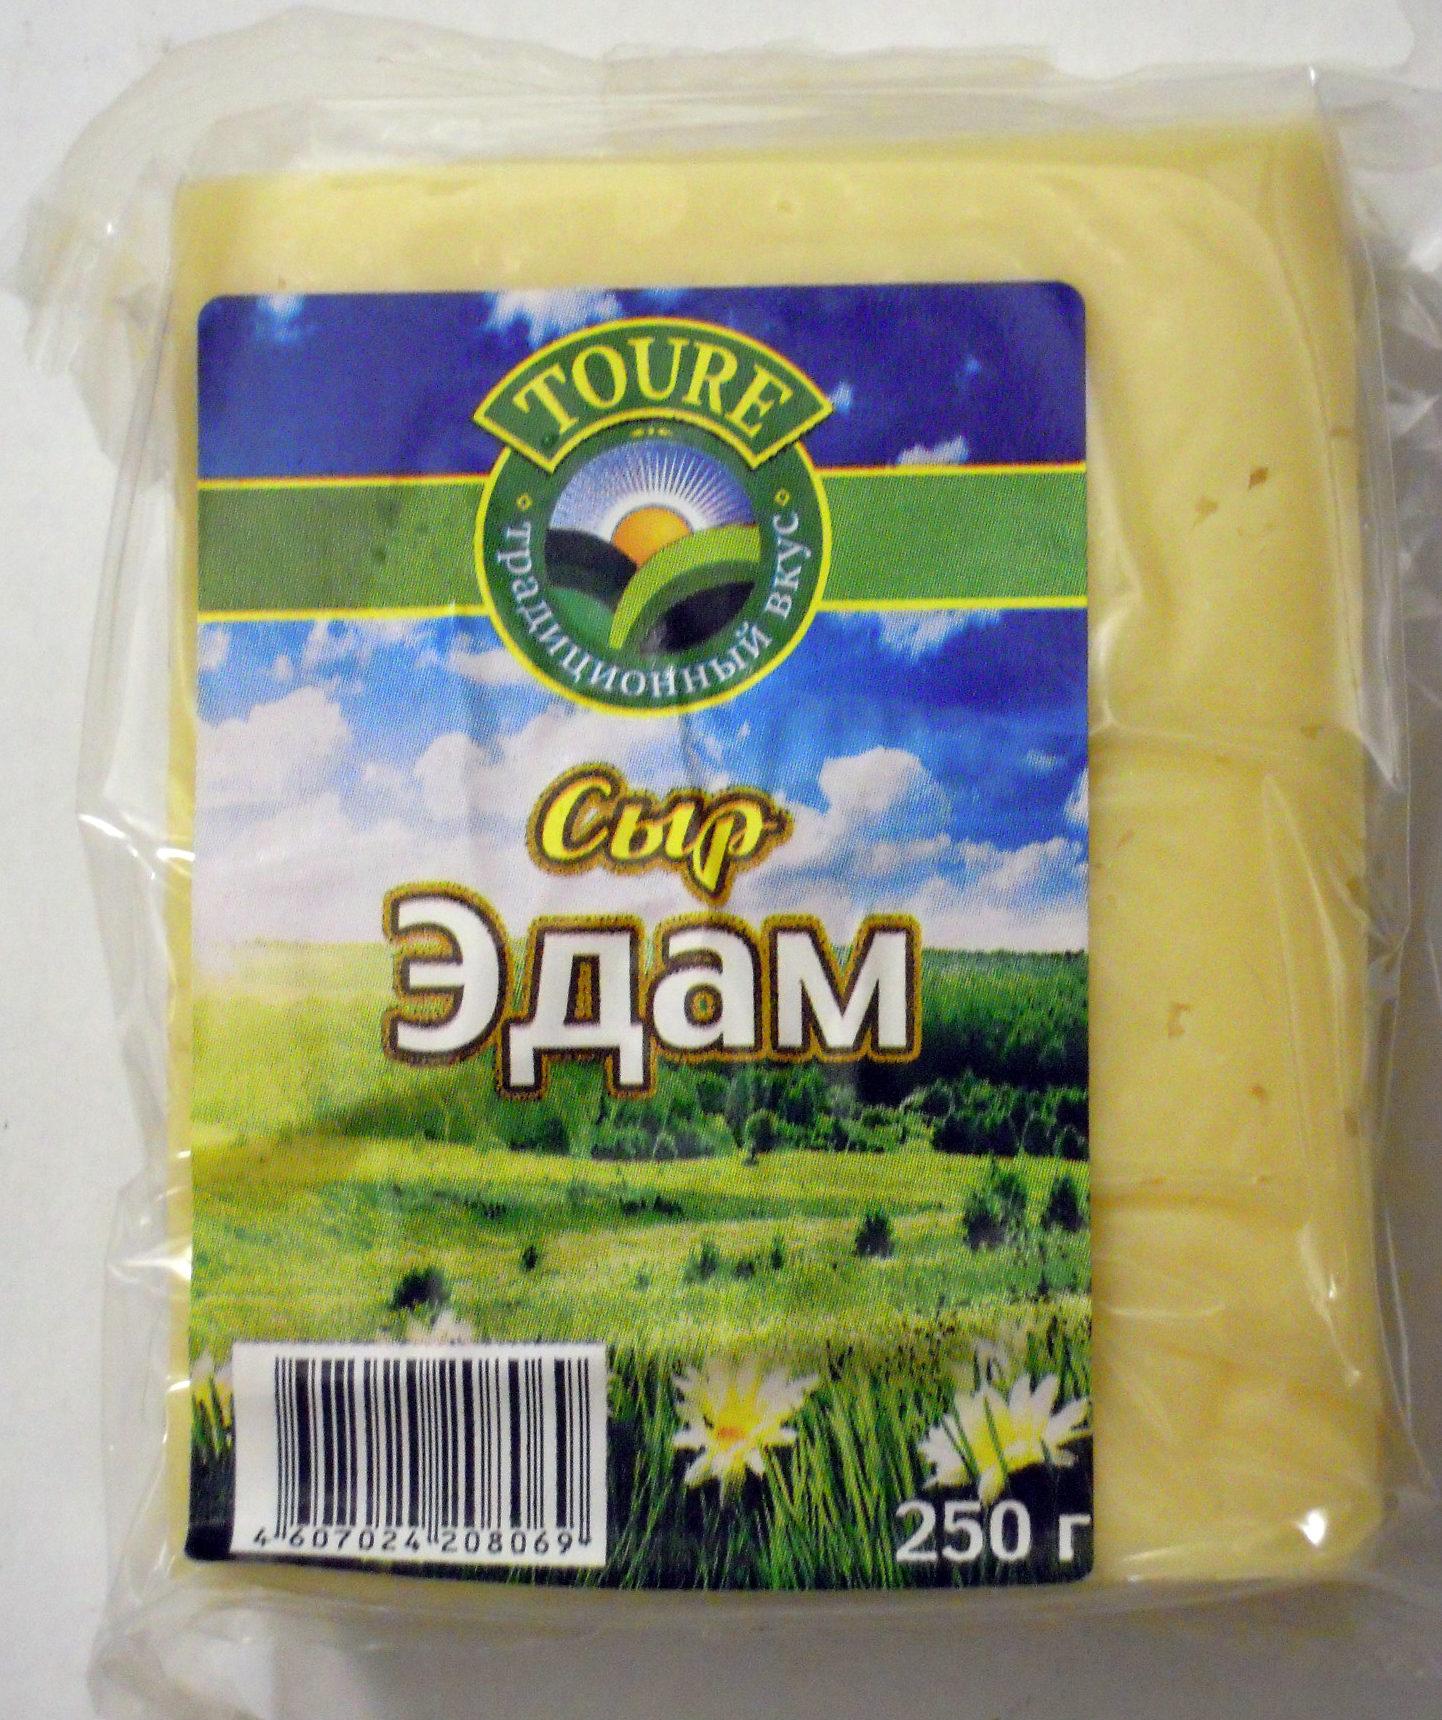 Сыр Эдам - Product - ru